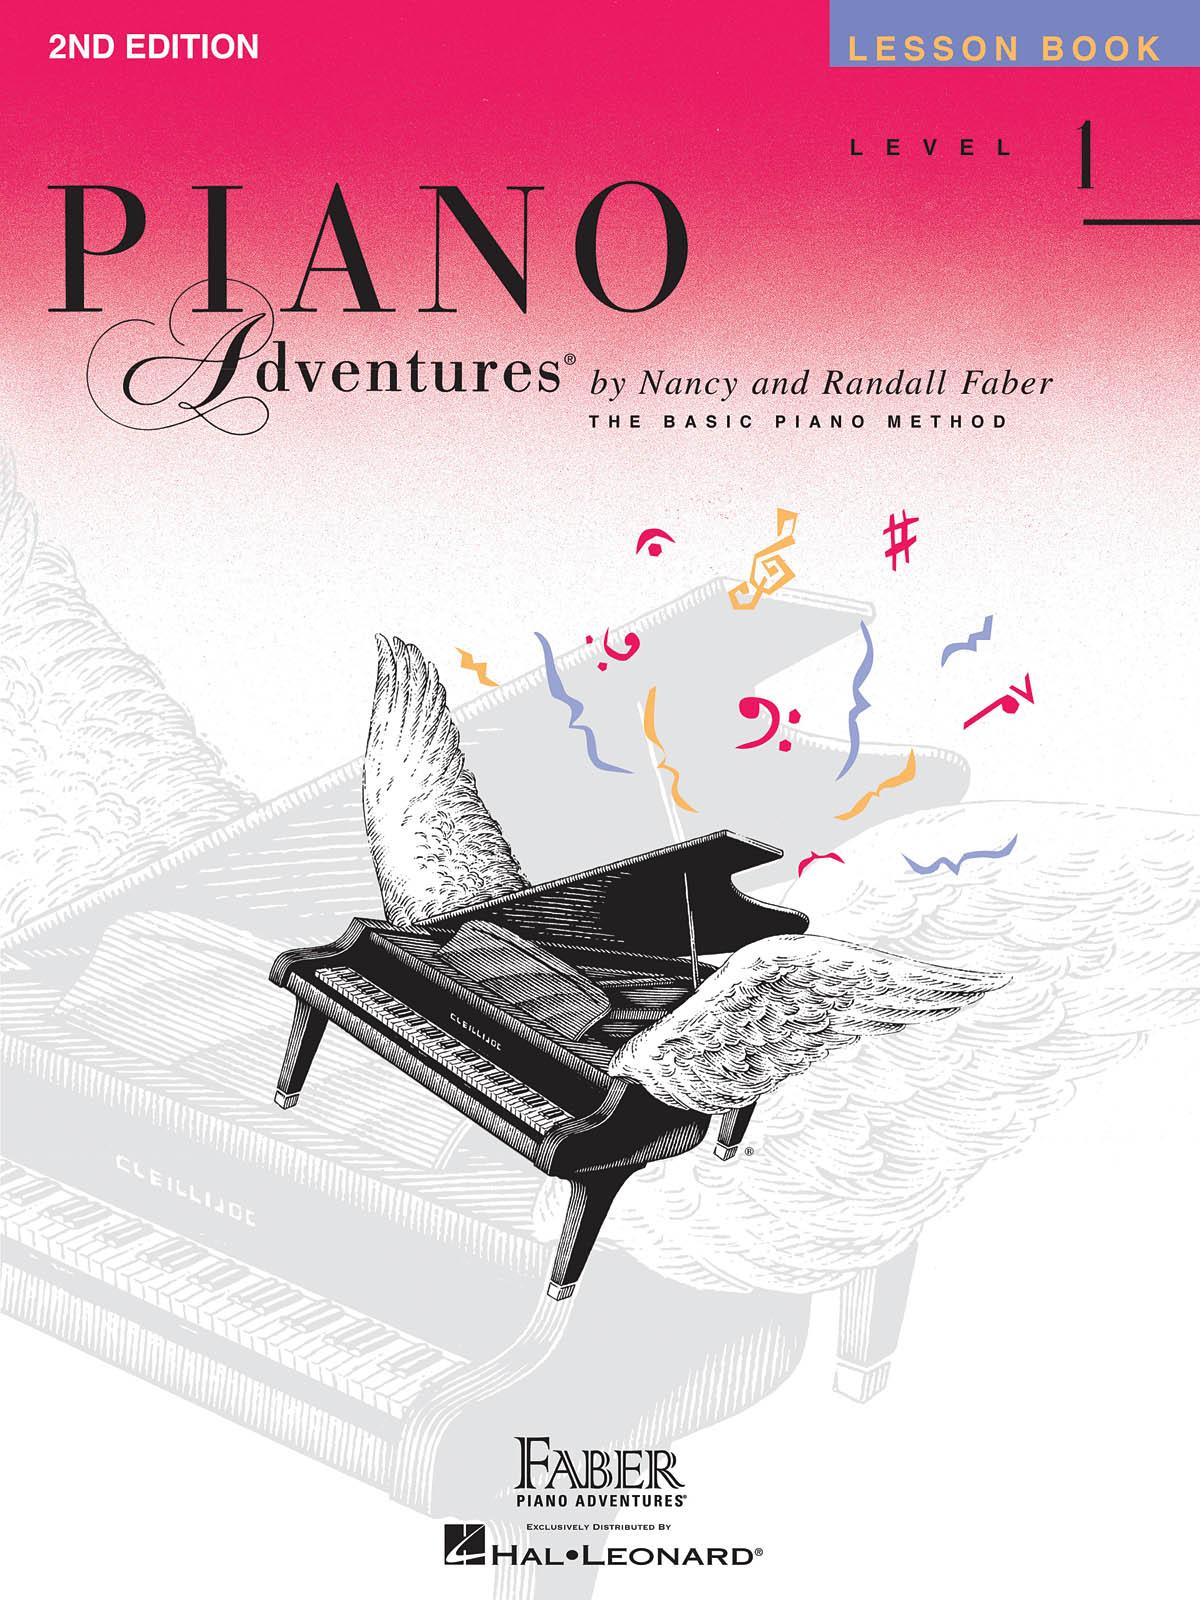 Faber Piano Adventures, Lesson Book, Level 1